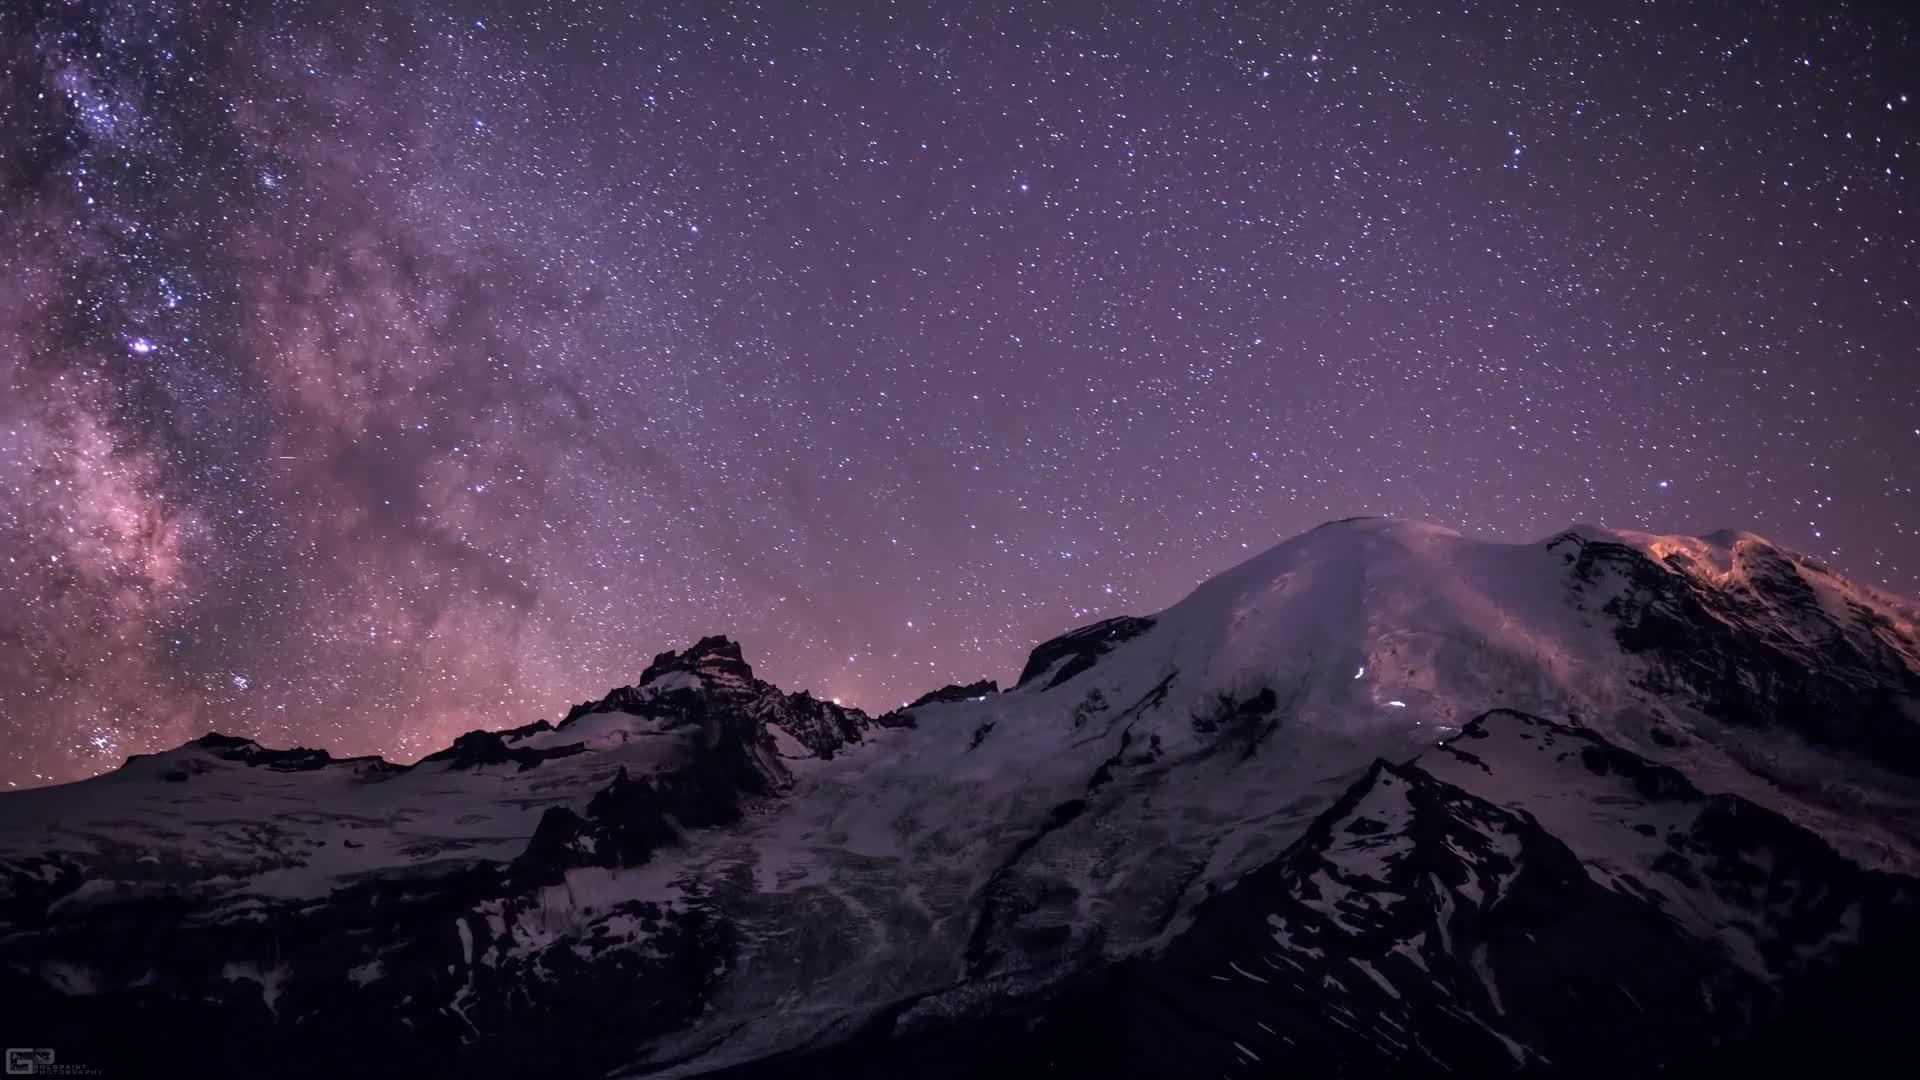 earthgifs, woahdude, Climbers on Mount Rainier (reddit) GIFs